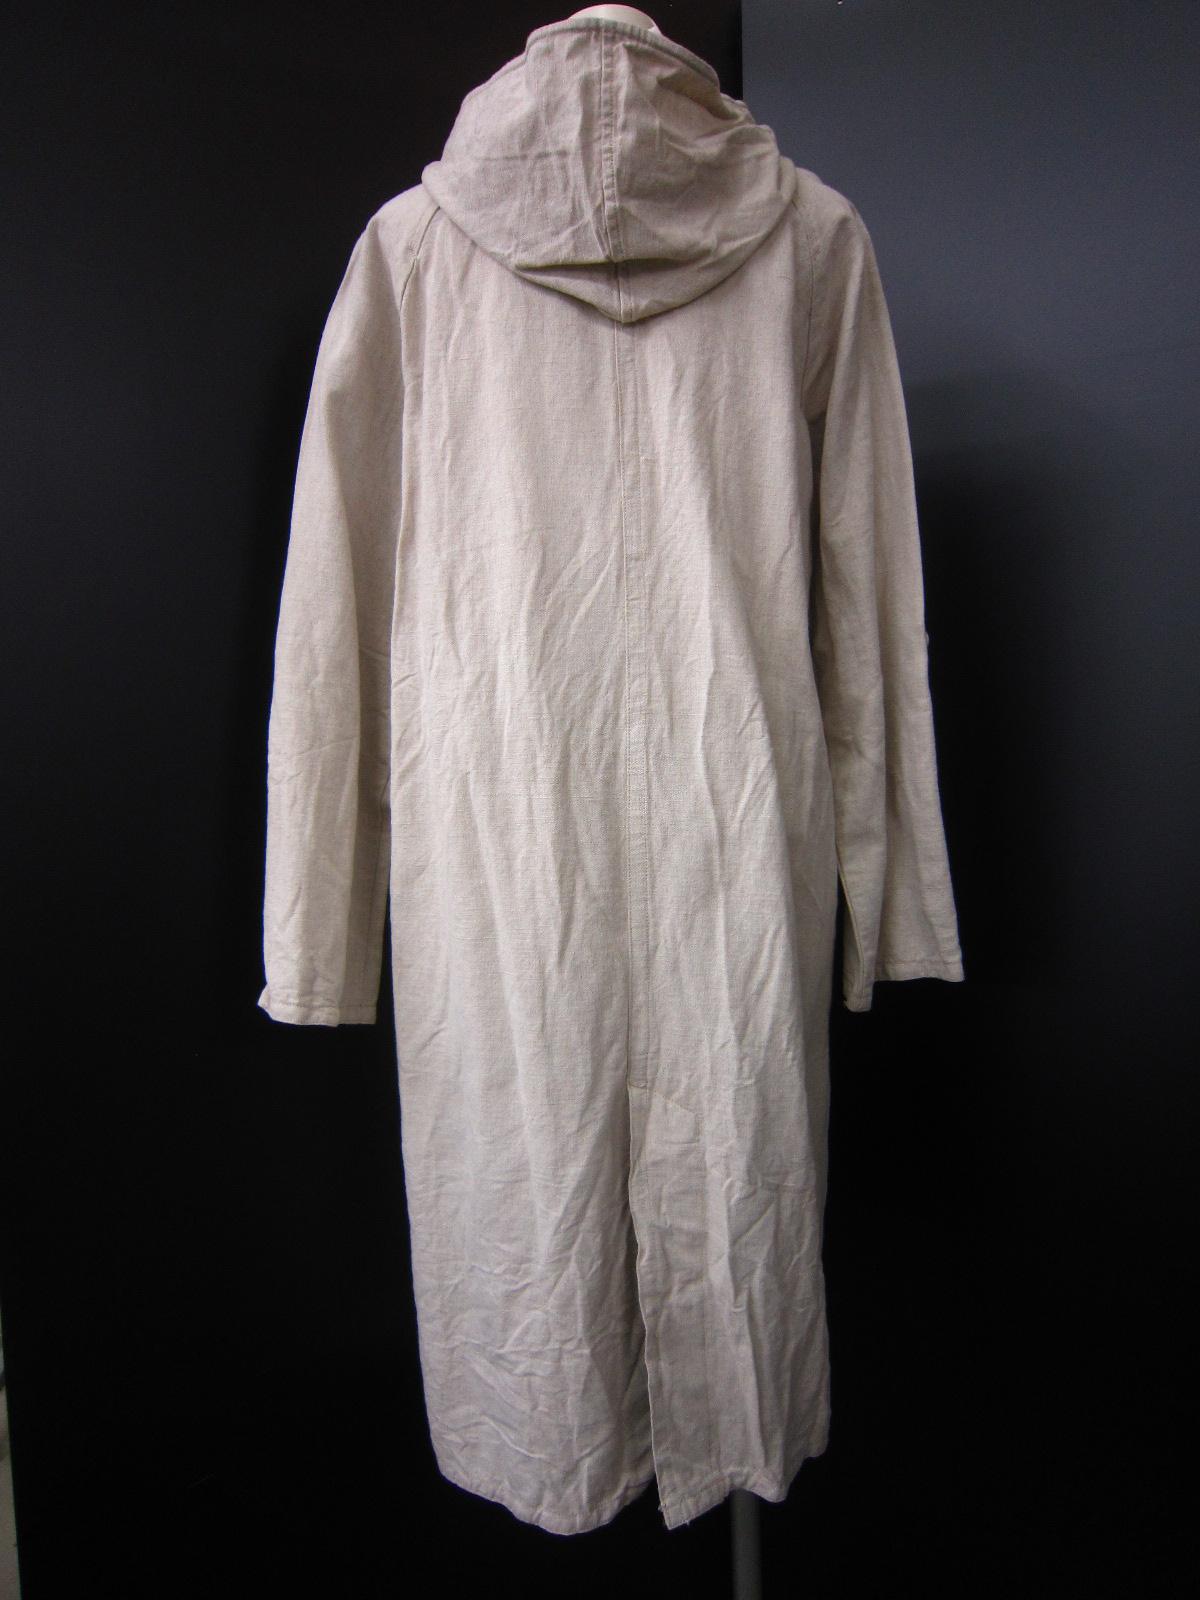 Sloe(スロウ)のコート